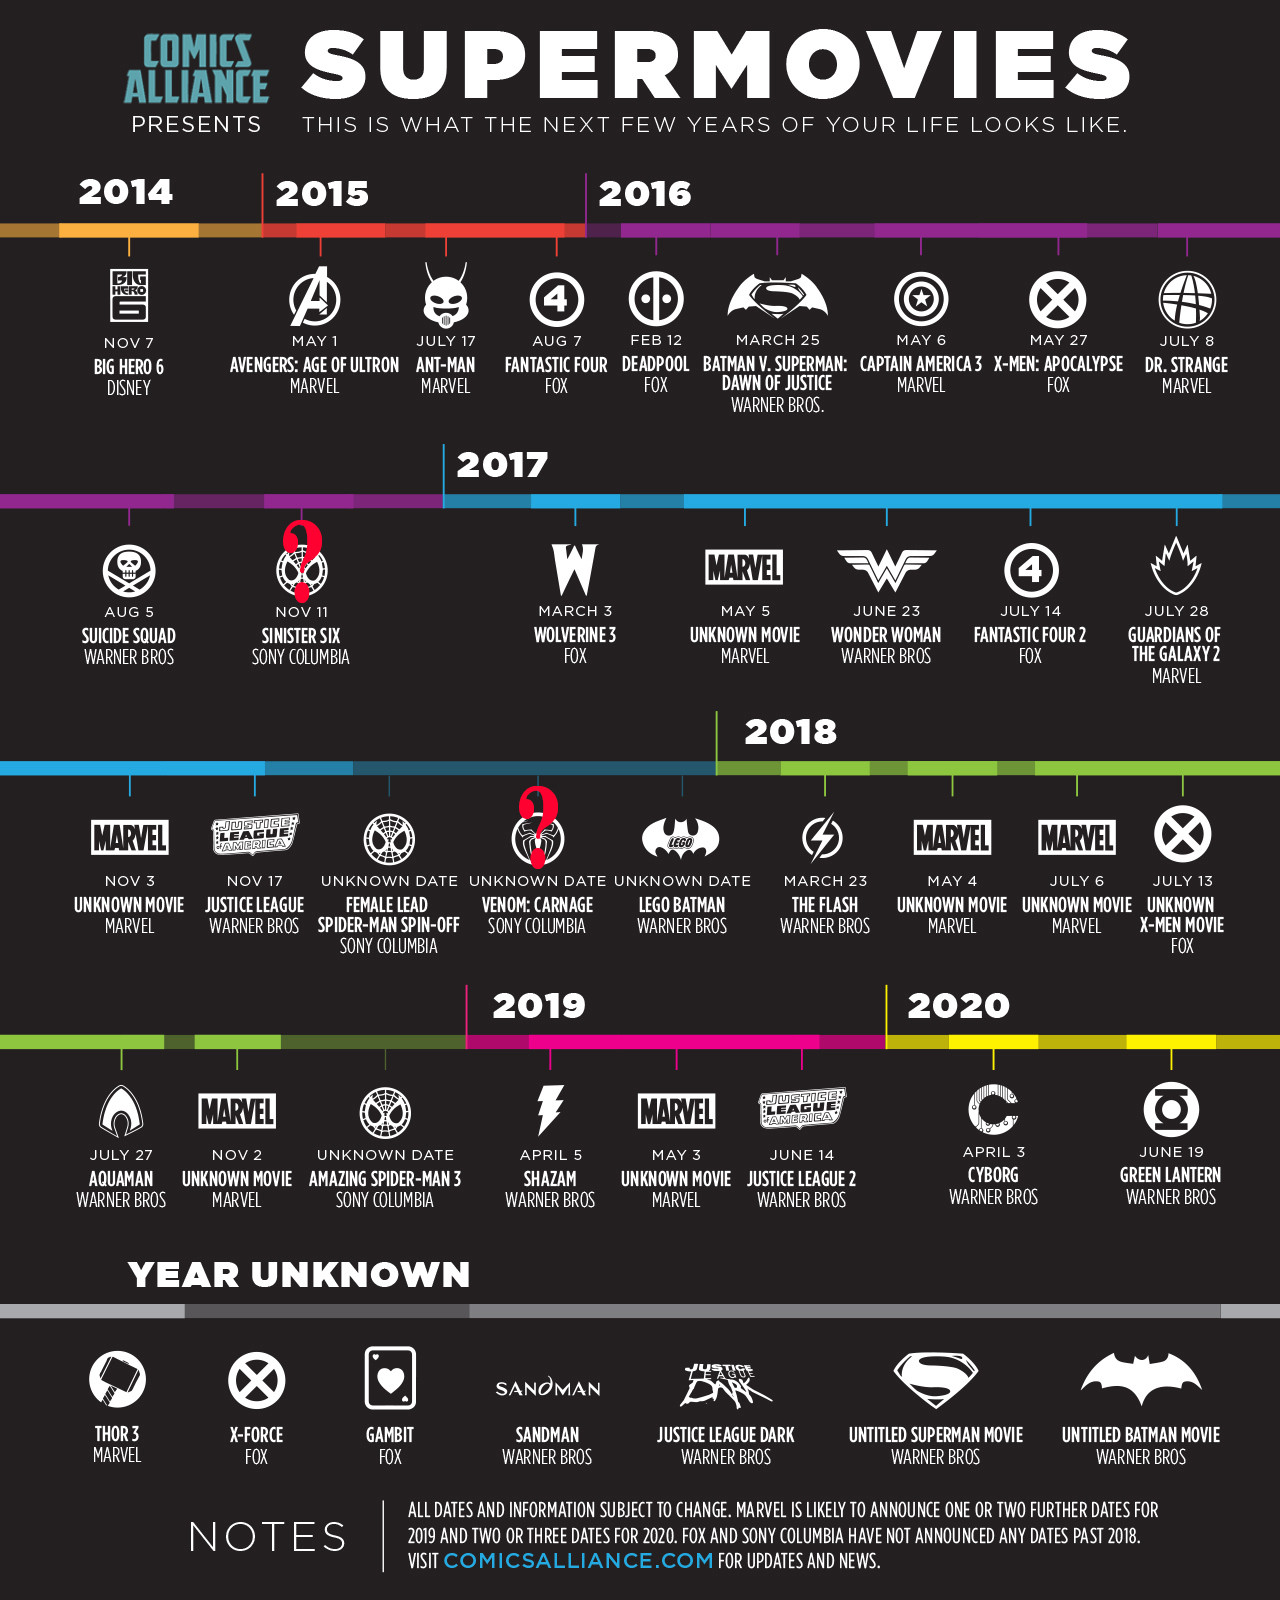 Calendario de películas de superhéroes